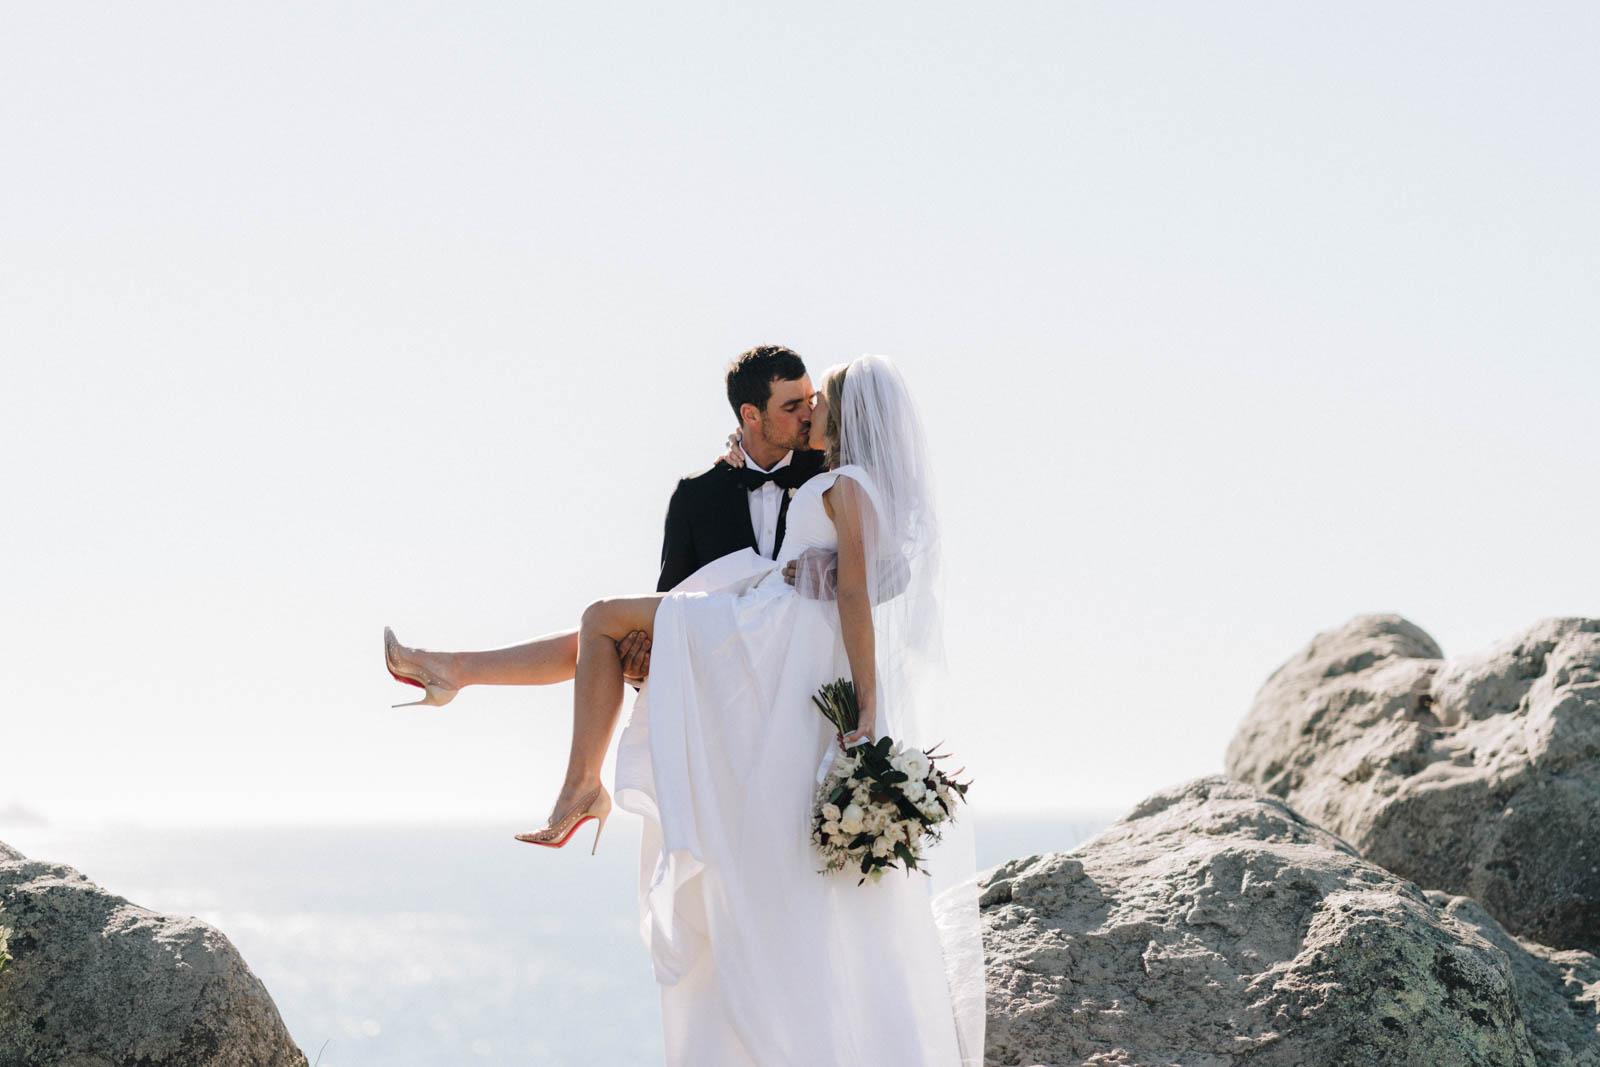 newfound-s-p-mt-maunganui-tauranga-wedding-photographer-1458-A9_04883